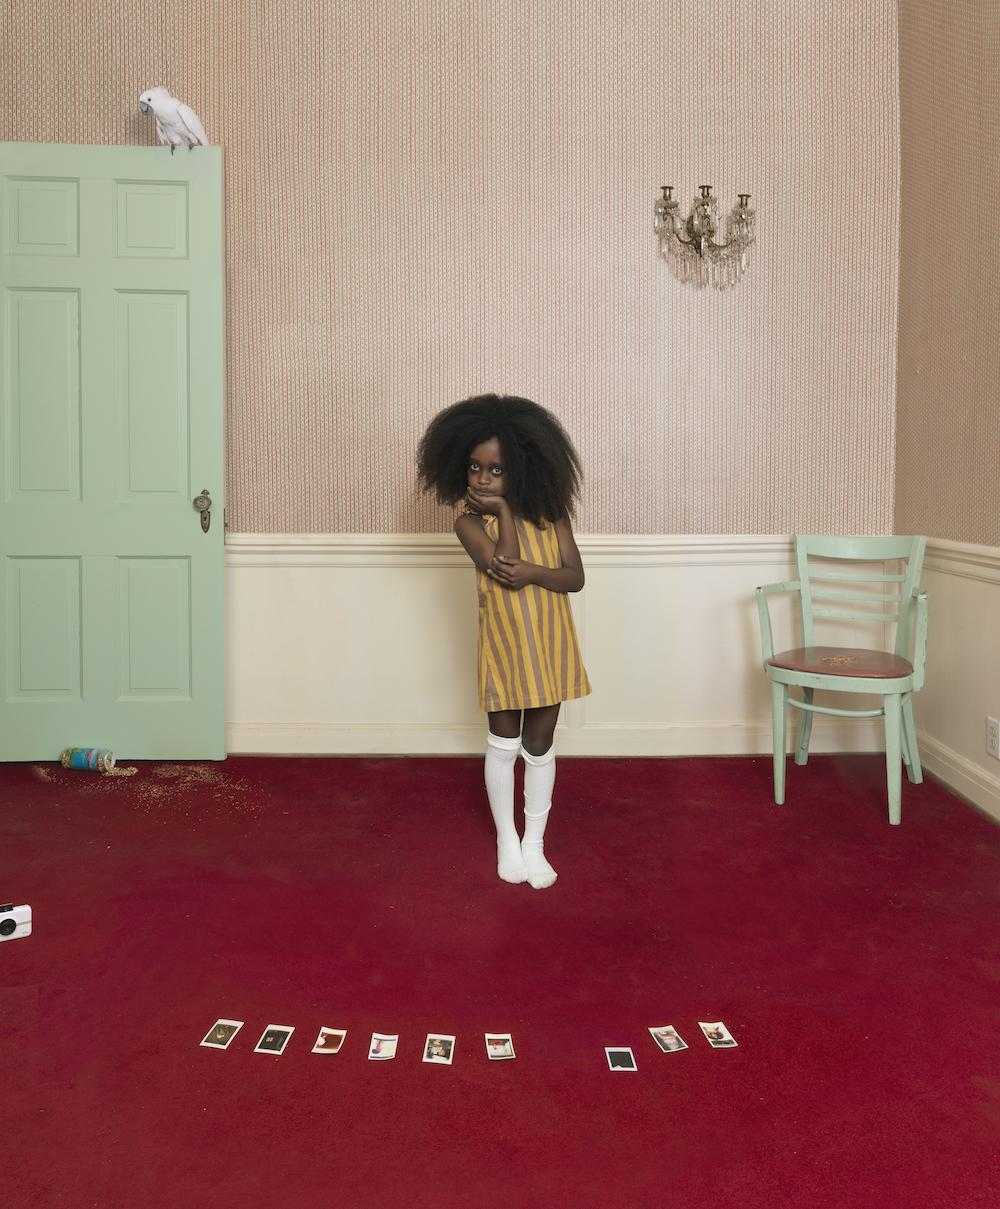 "Julie Blackmon, Ezra, 2019, archival pigment print, 30.5 x 26"", 42.25 x 35.75"", 52.3 x 44"" editions of 10, 7, 5, price on request"